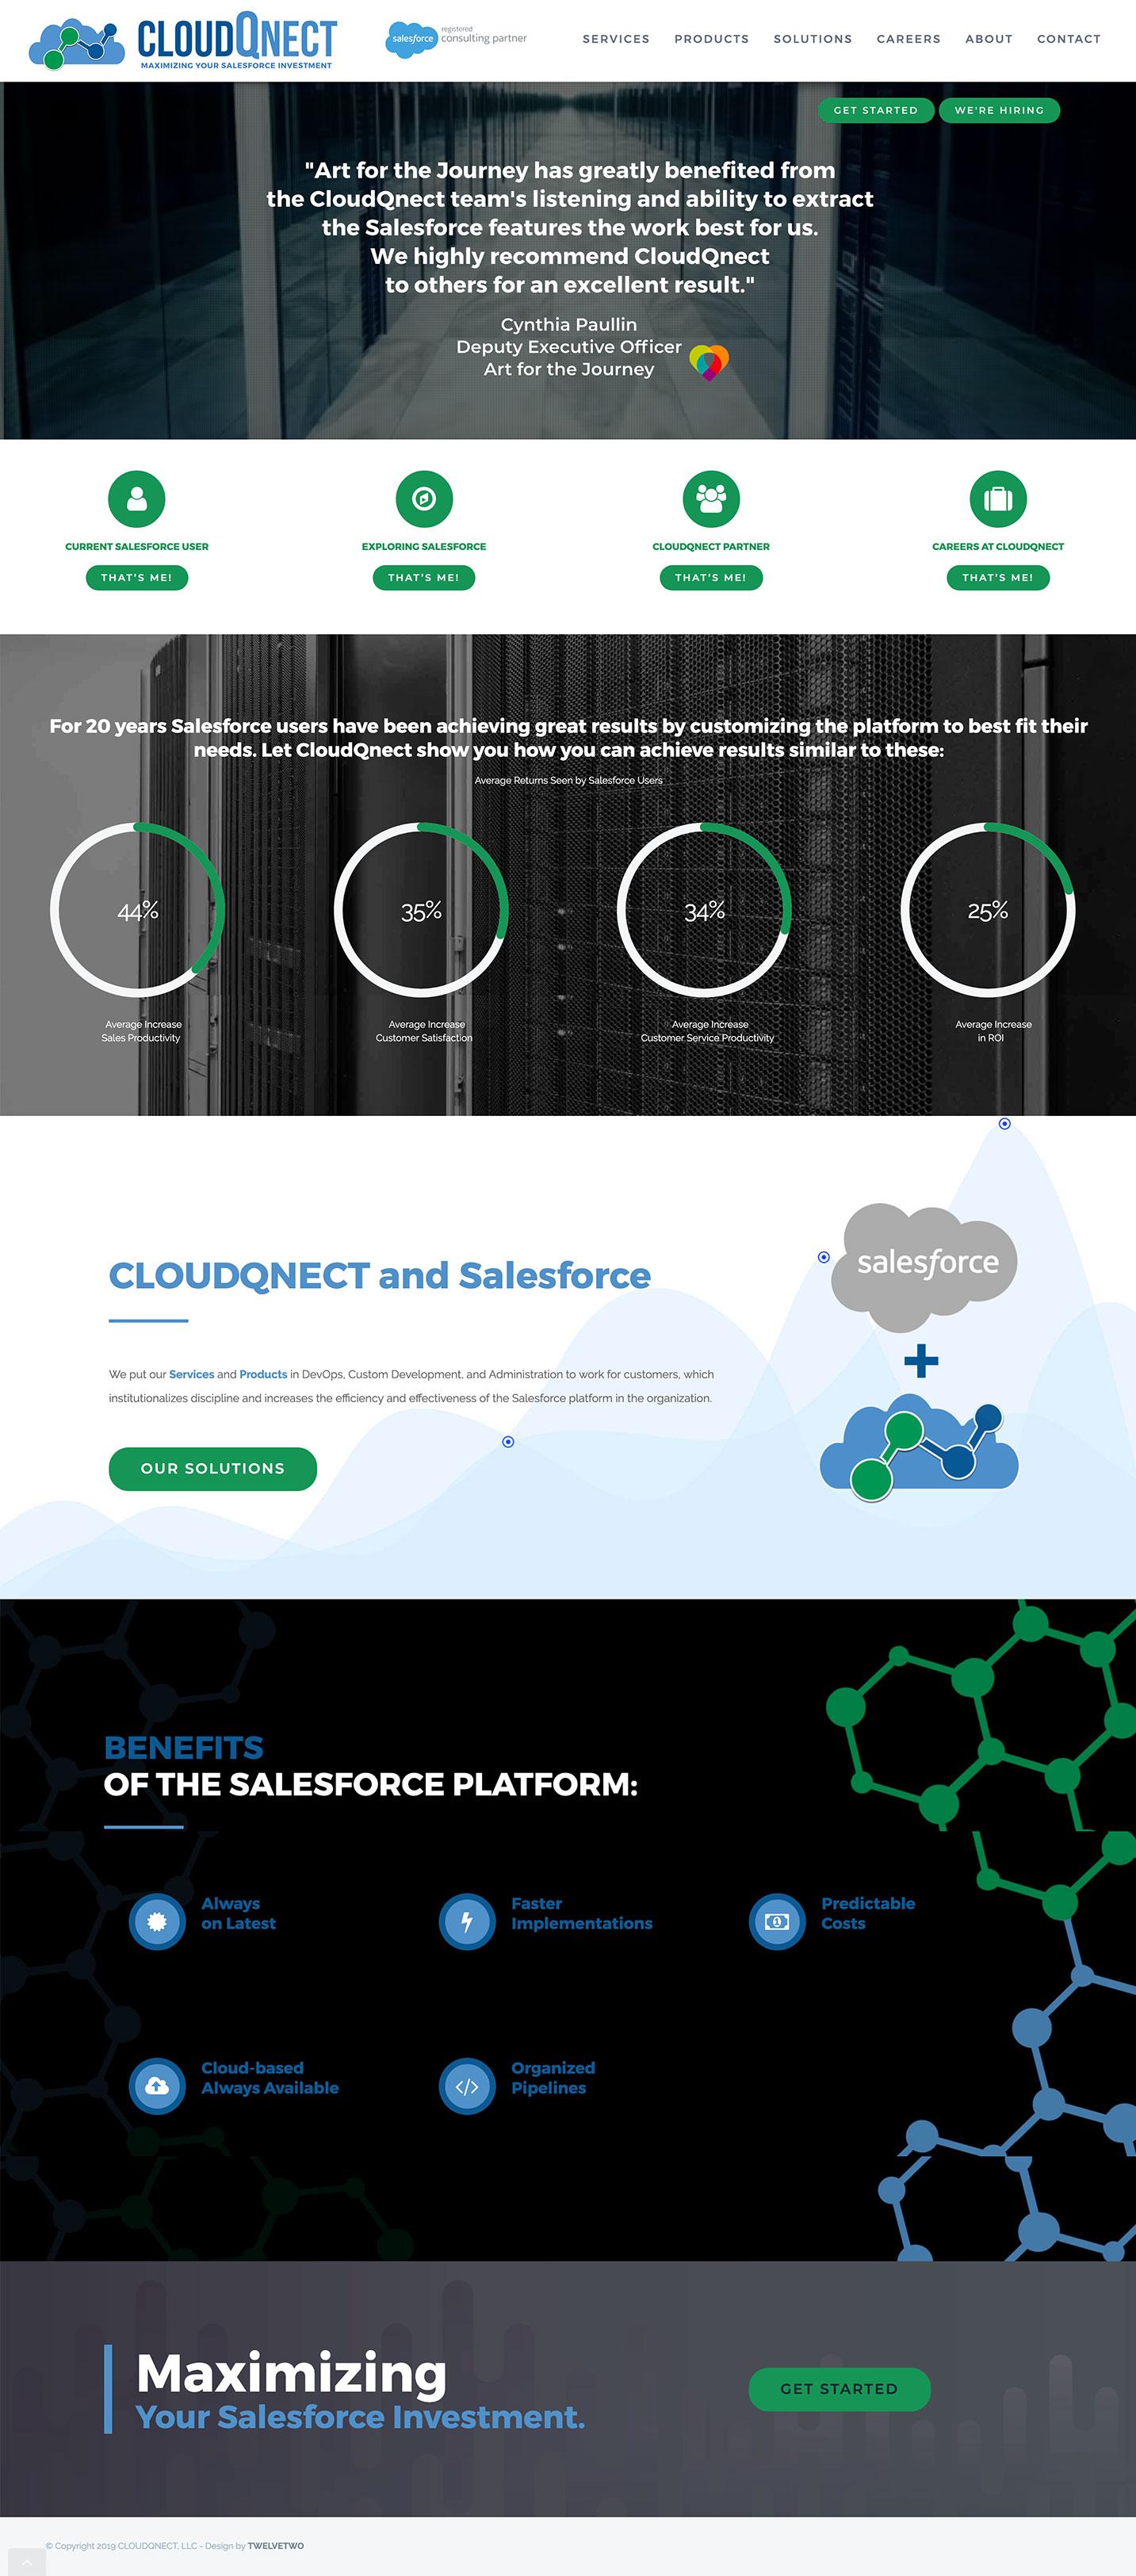 screencapture-cloudqnect-2019-05-15-08_37_24